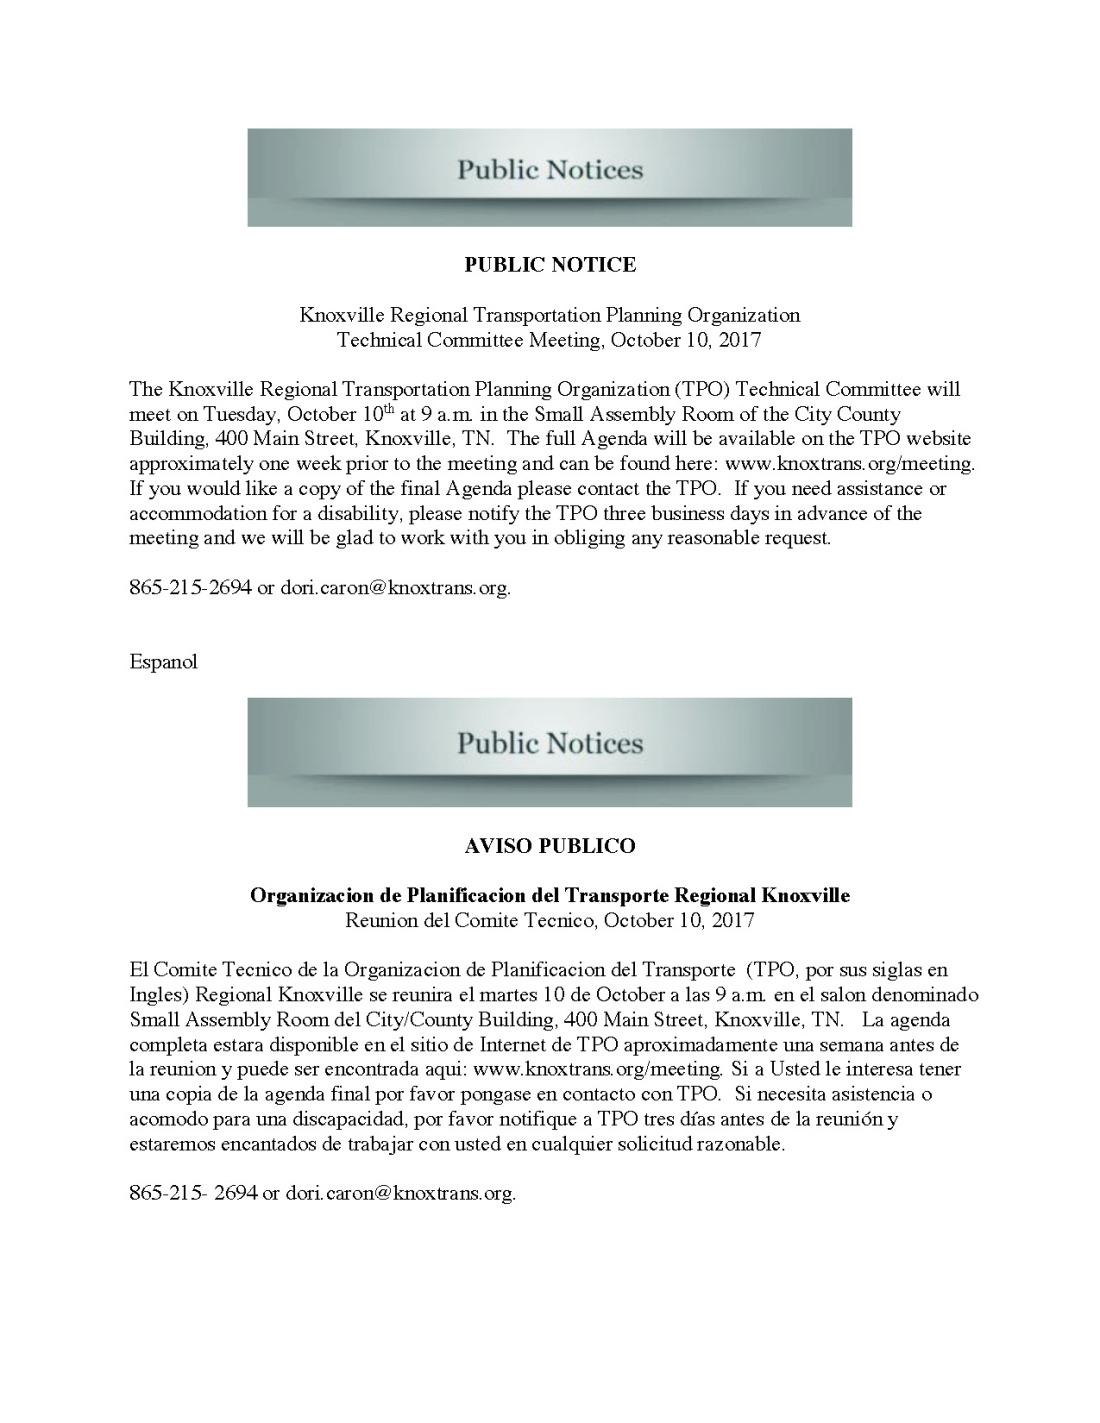 October 10, 2017  PUBLIC NOTICE  TC.jpg